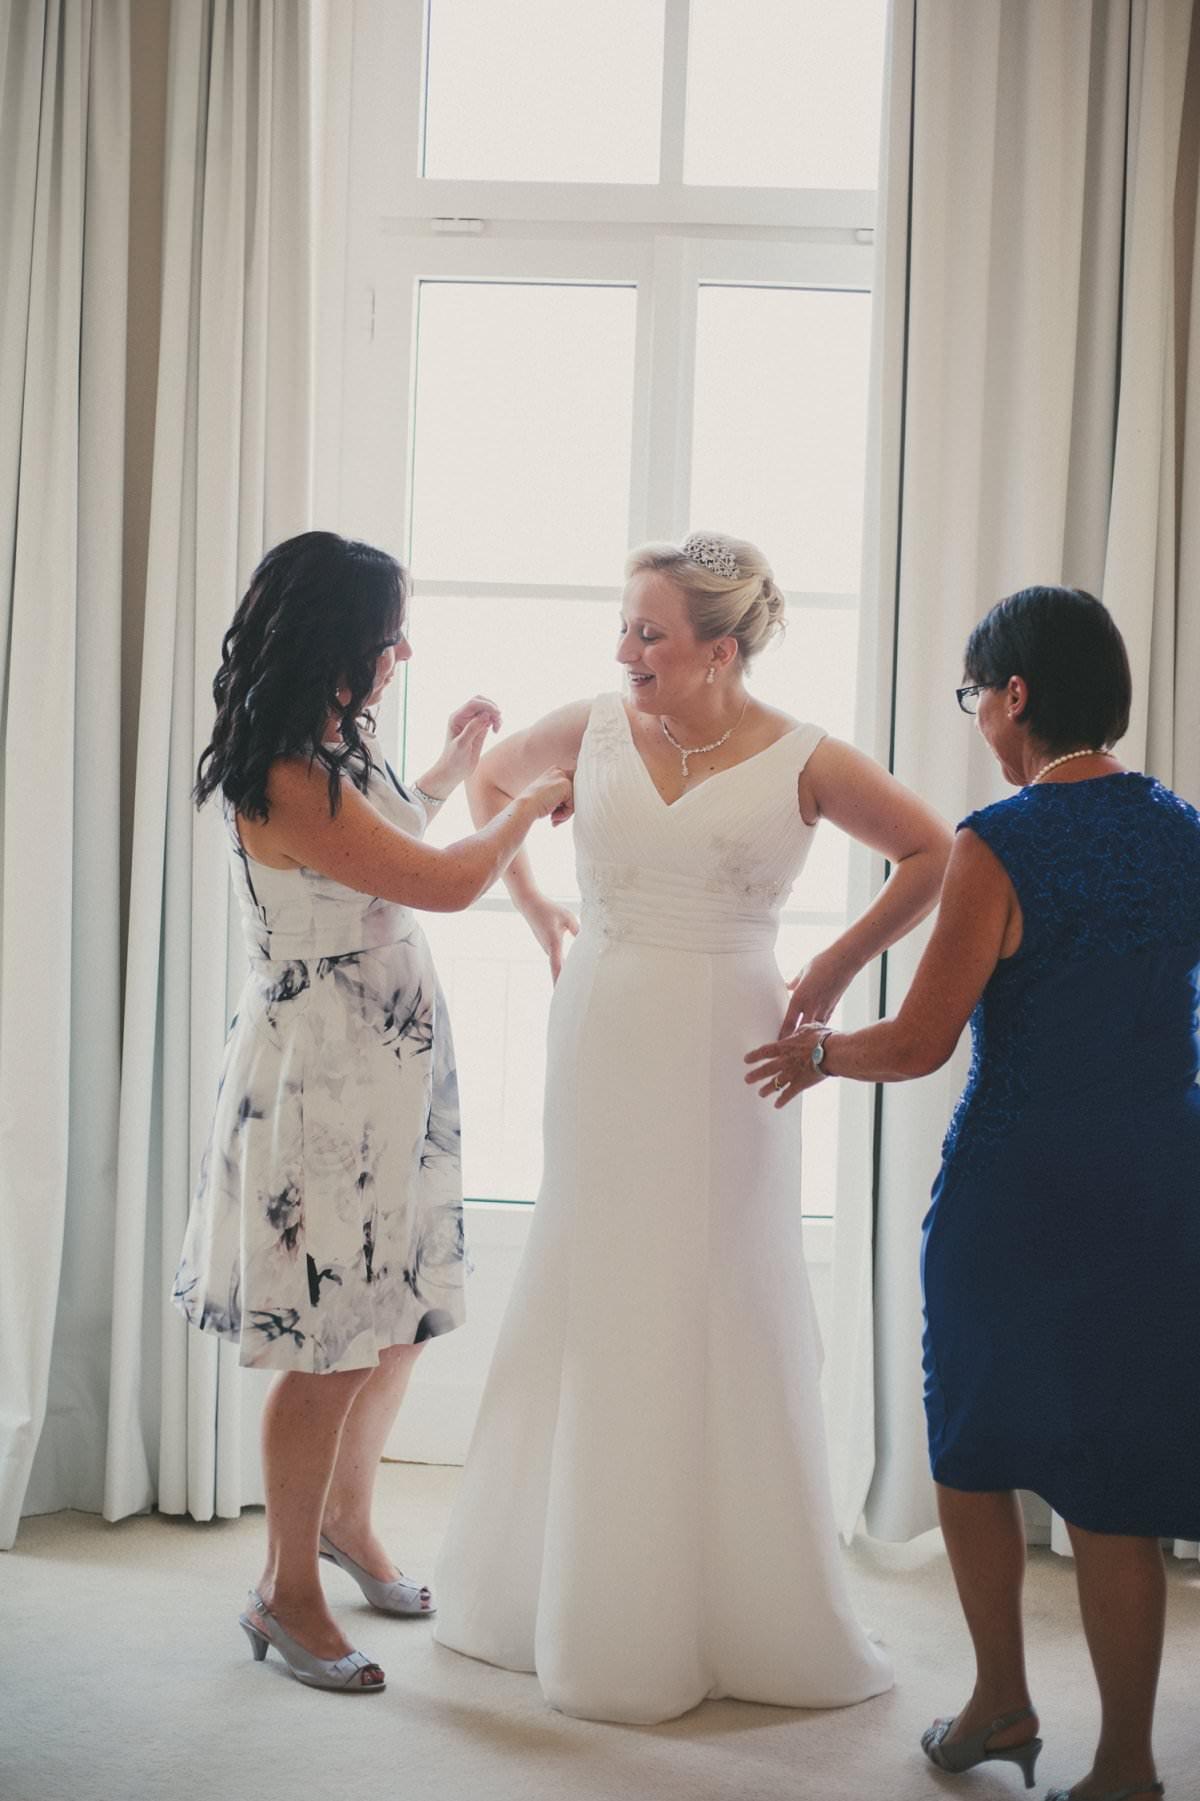 fine-art-destination-wedding-photography-bonn-germany-019